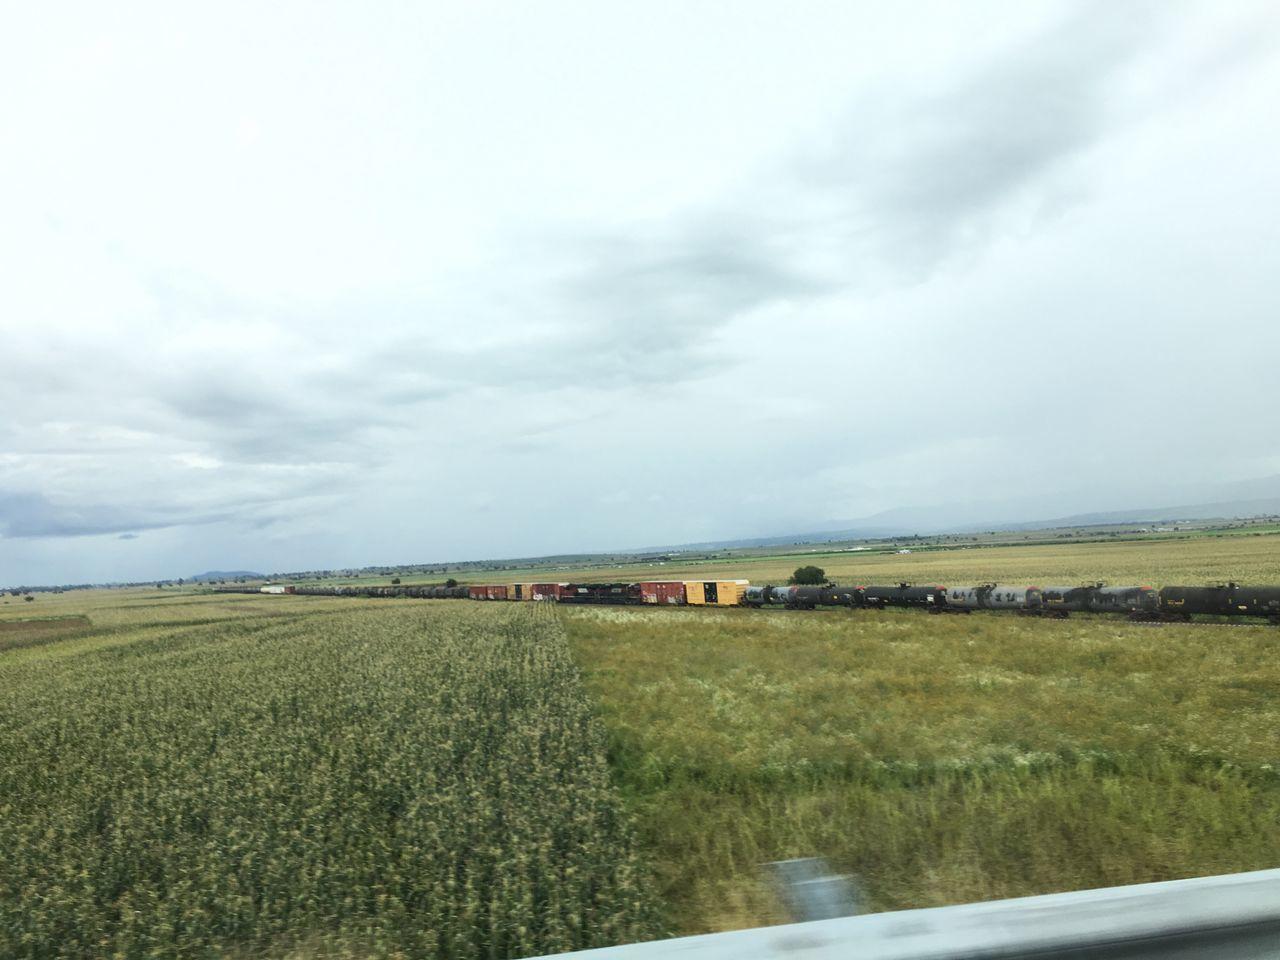 La Bestia Landscape Cornfield Trains Onmove First Eyeem Photo LaBestia